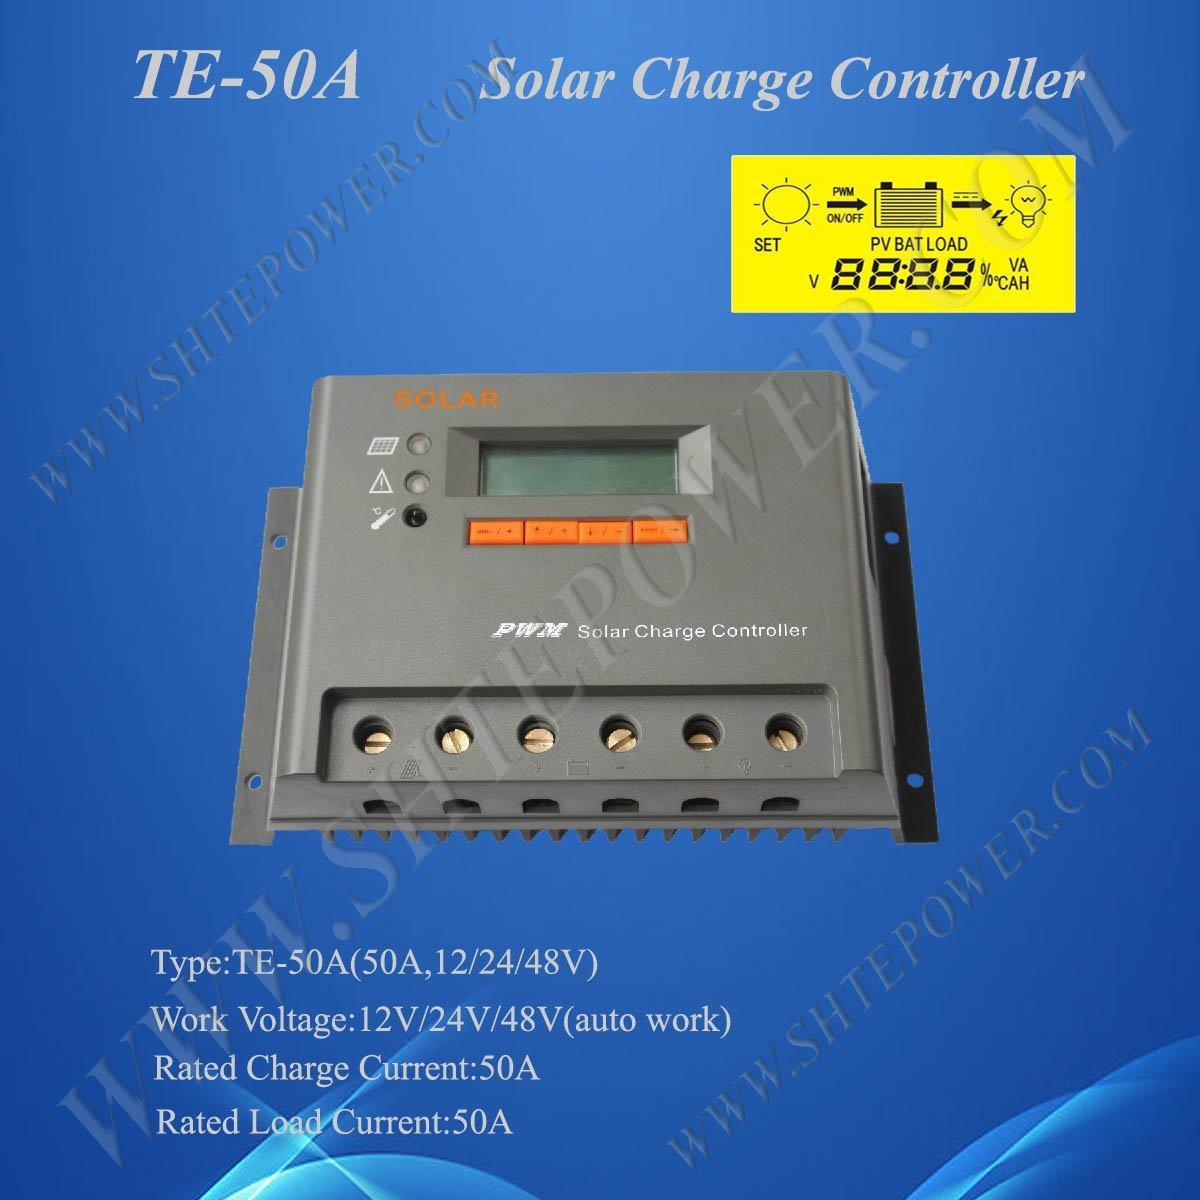 50A 12 V 24 V 48 V автоматический регулятор заряда, 2 года гарантии, CE& ROHS утвержден